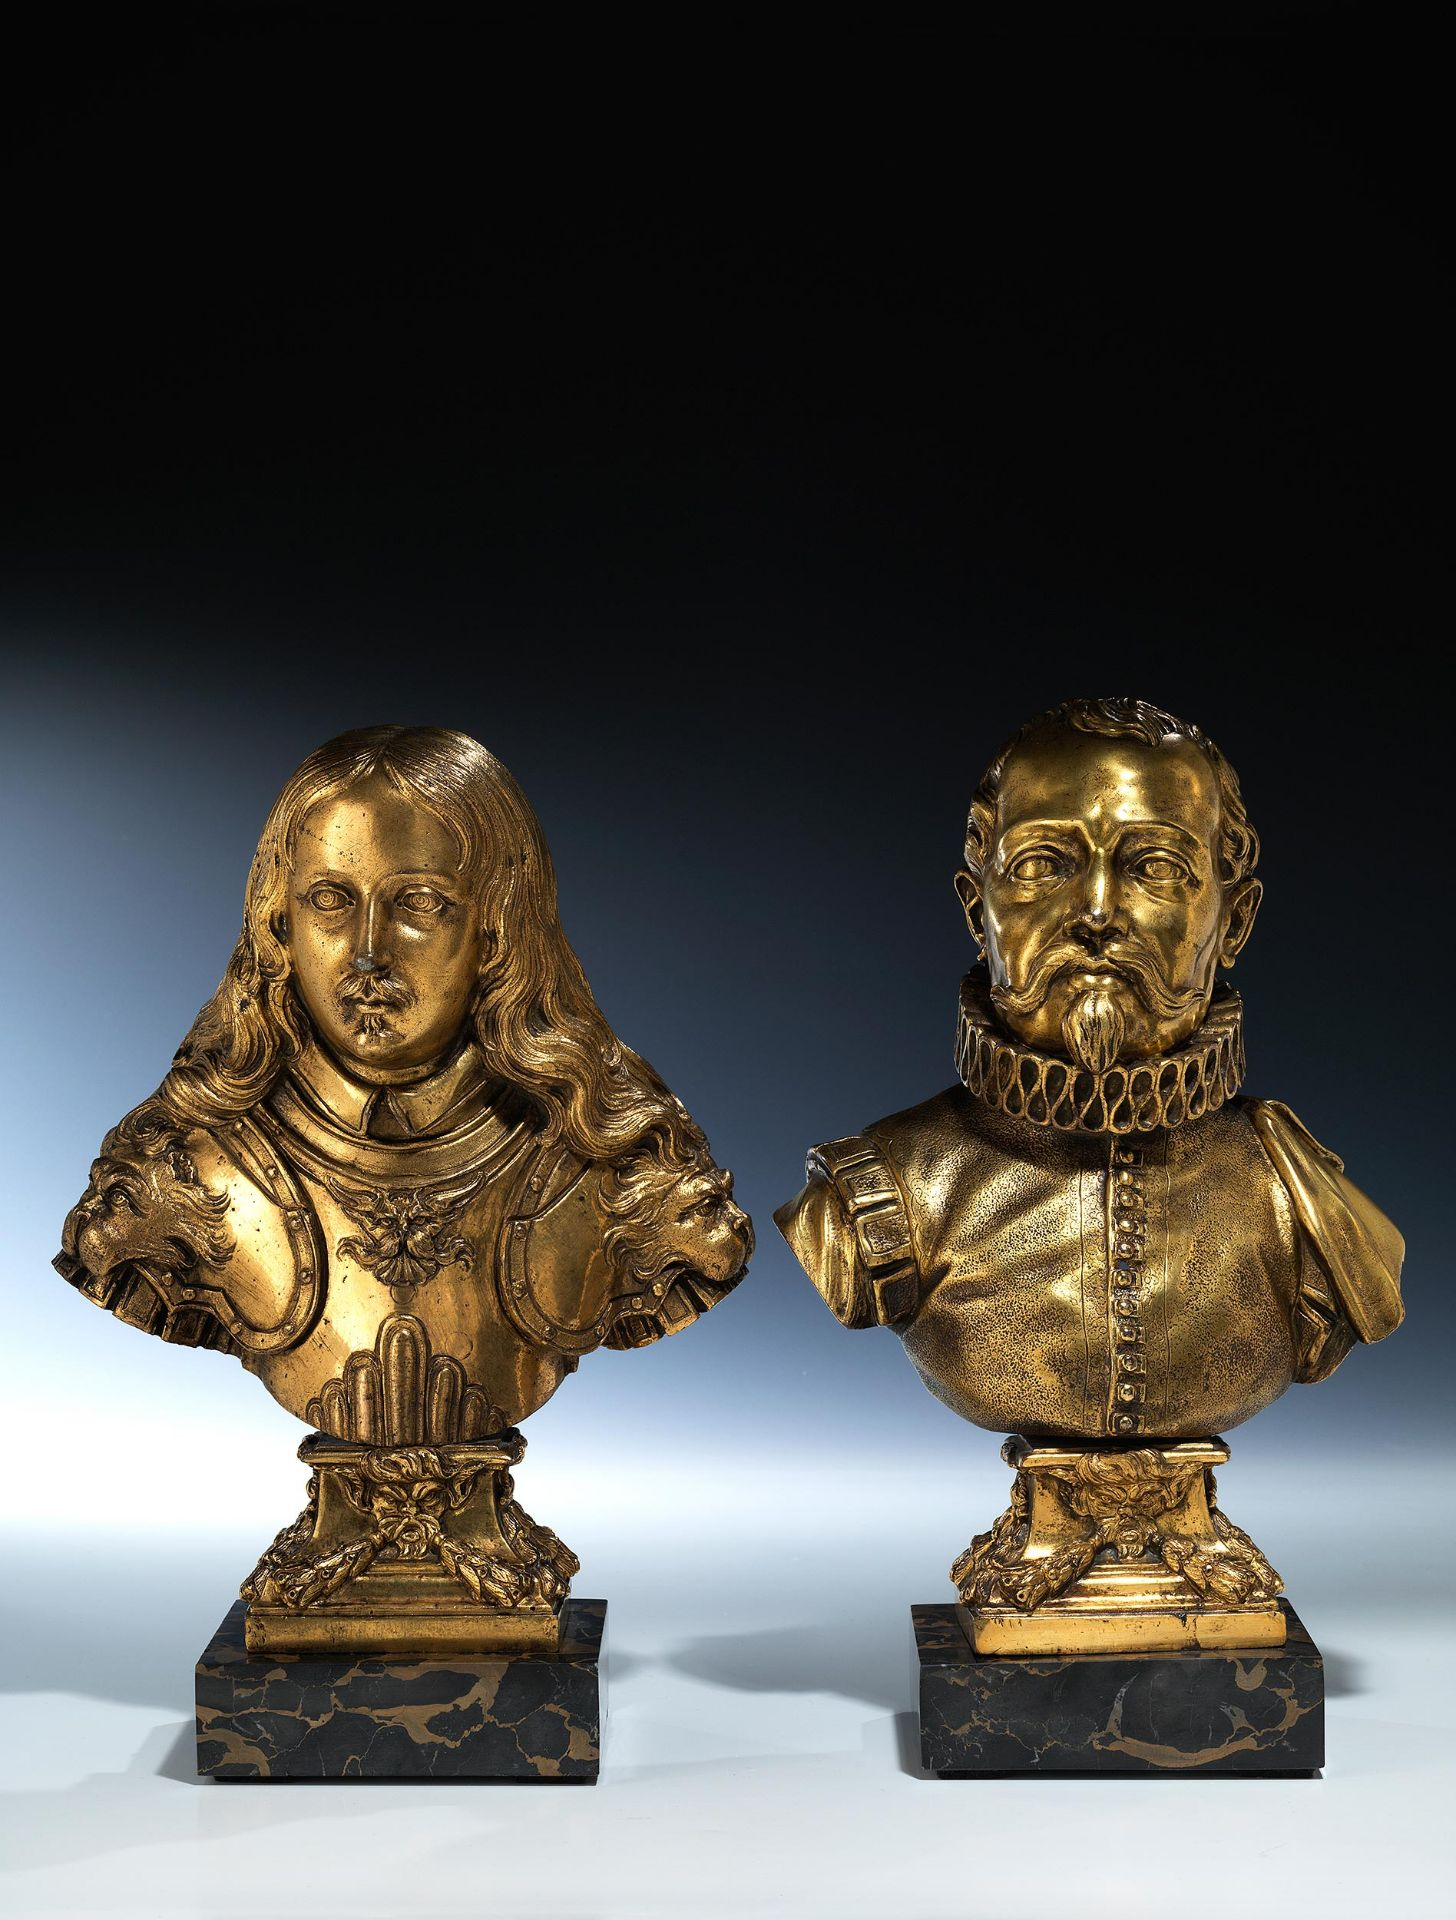 Paar vergoldete Bronzebüsten einer berühmten Serie